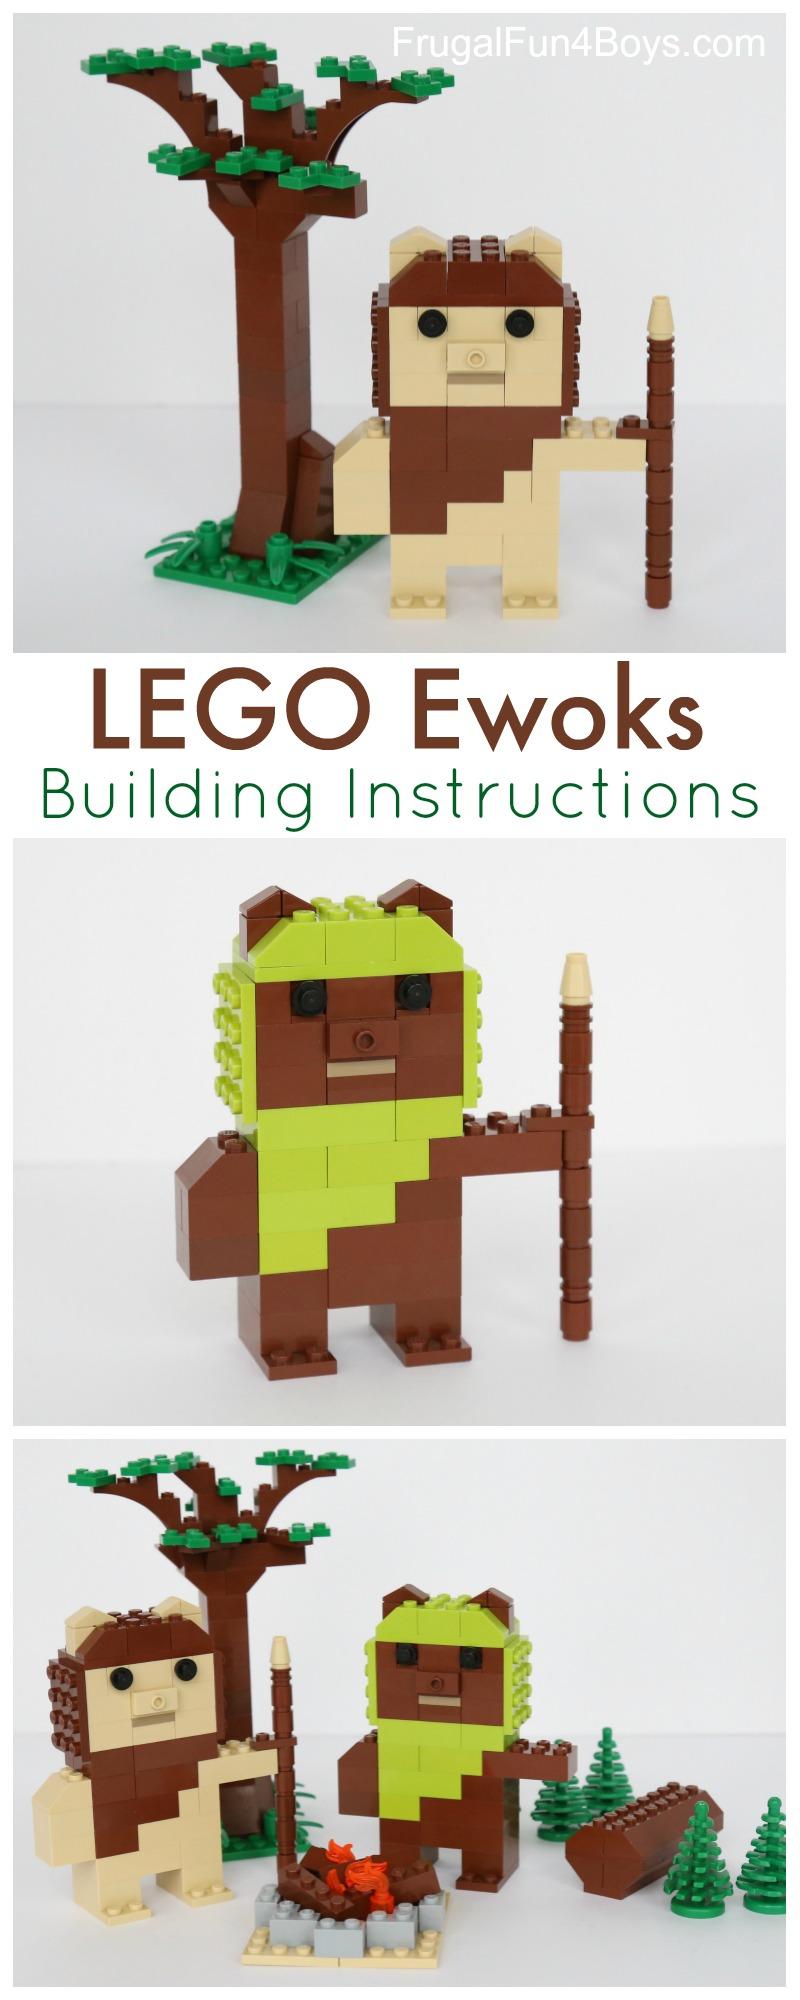 LEGO Ewoks with Building Instructions